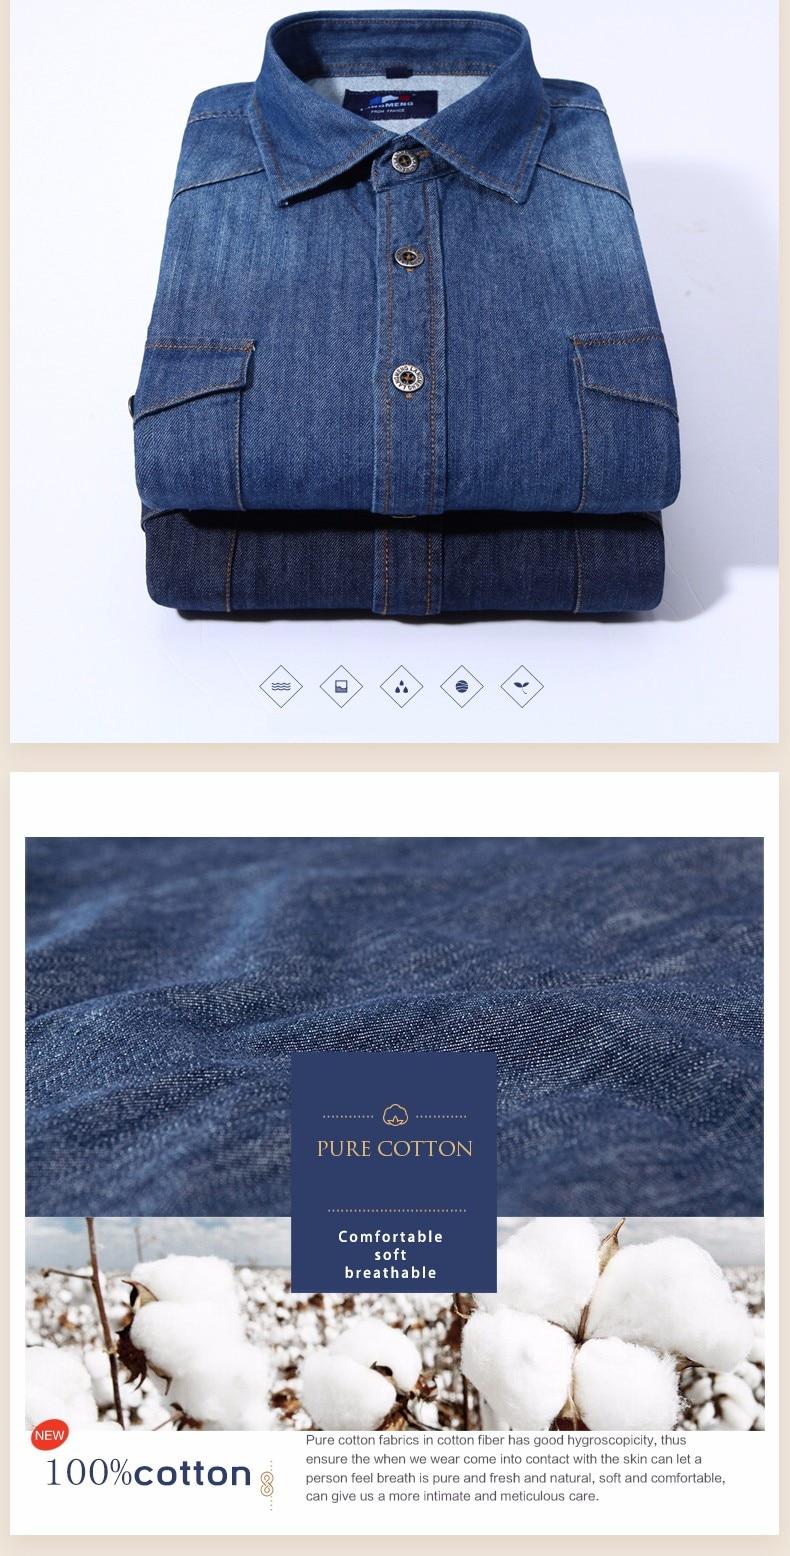 Langmeng 2016 איכותית 100% כותנה צבע מוצק שרוול ארוך מזדמן חולצת slim fit ג 'ינס, חולצות גברים ג' ינס, חולצות מותג שמלת חולצה